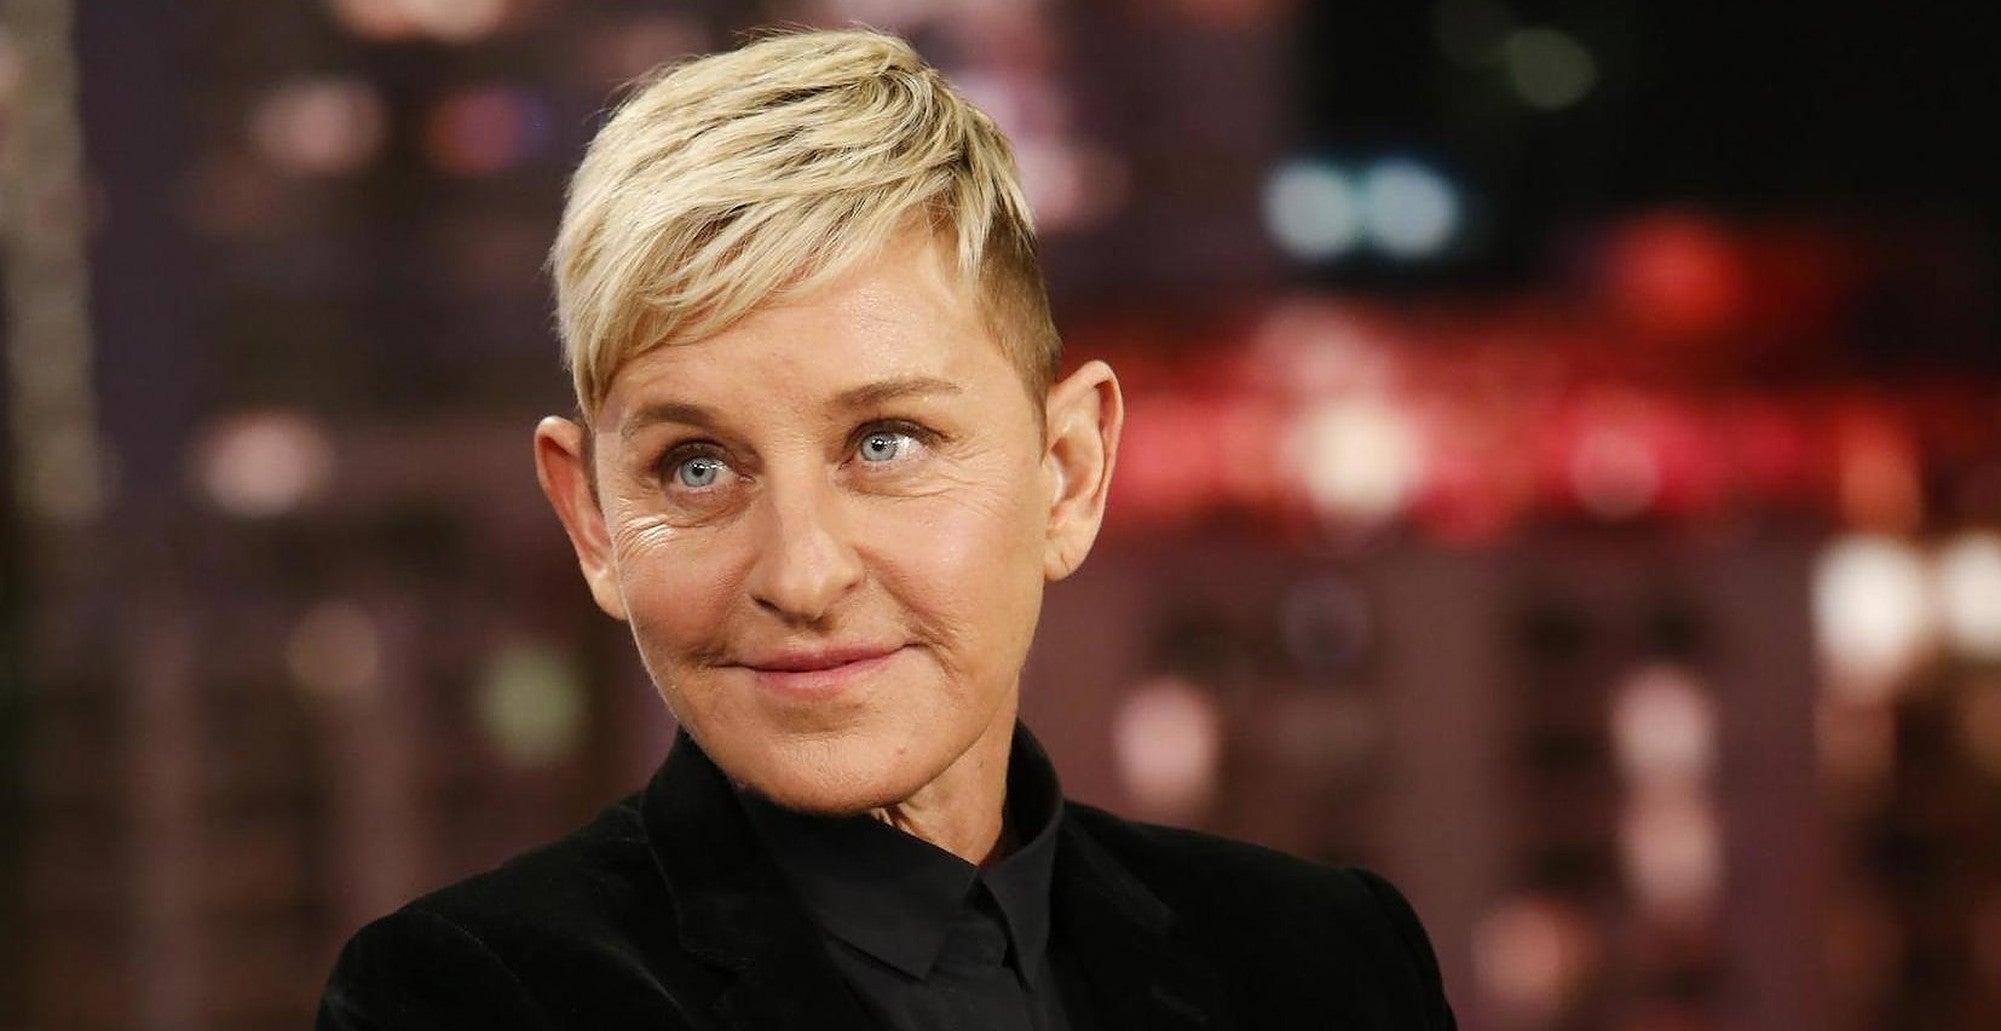 """The Ellen Show"" investigado por Warnermedia por maltrato laboral"